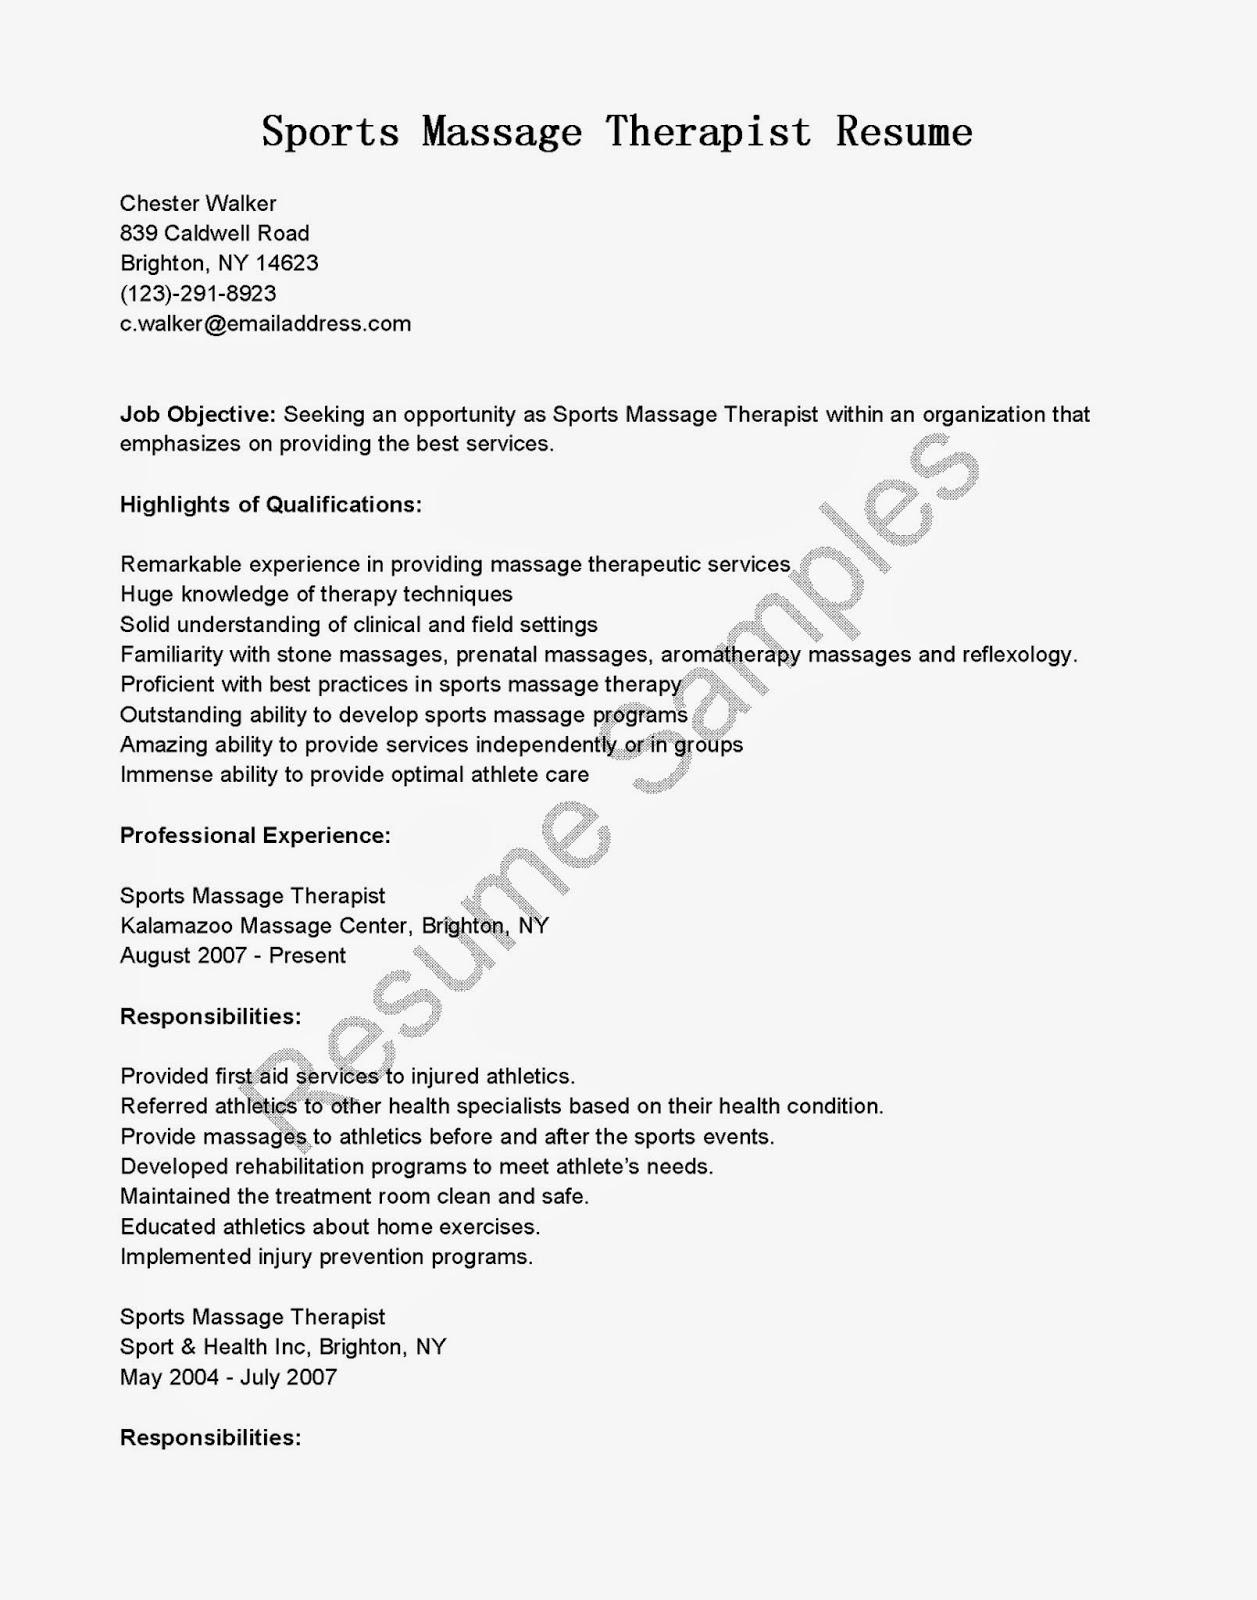 Resume Samples Sports Massage Therapist Resume